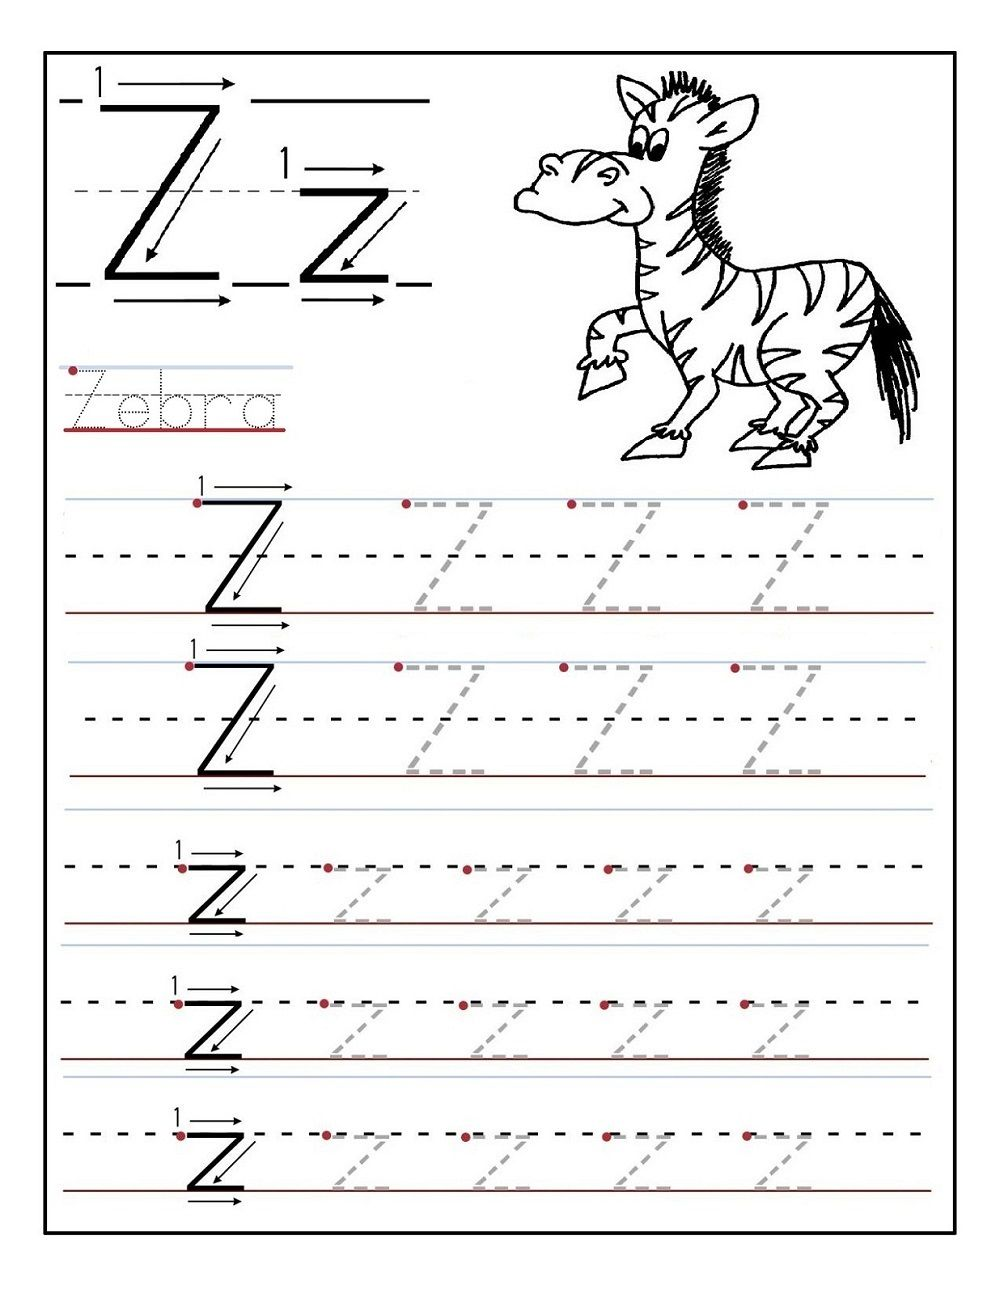 Tracing Worksheets 3 Year Old Fun Kiddo Shelter Alphabet Worksheets Preschool Alphabet Worksheets Kindergarten Tracing Worksheets [ 1294 x 1000 Pixel ]